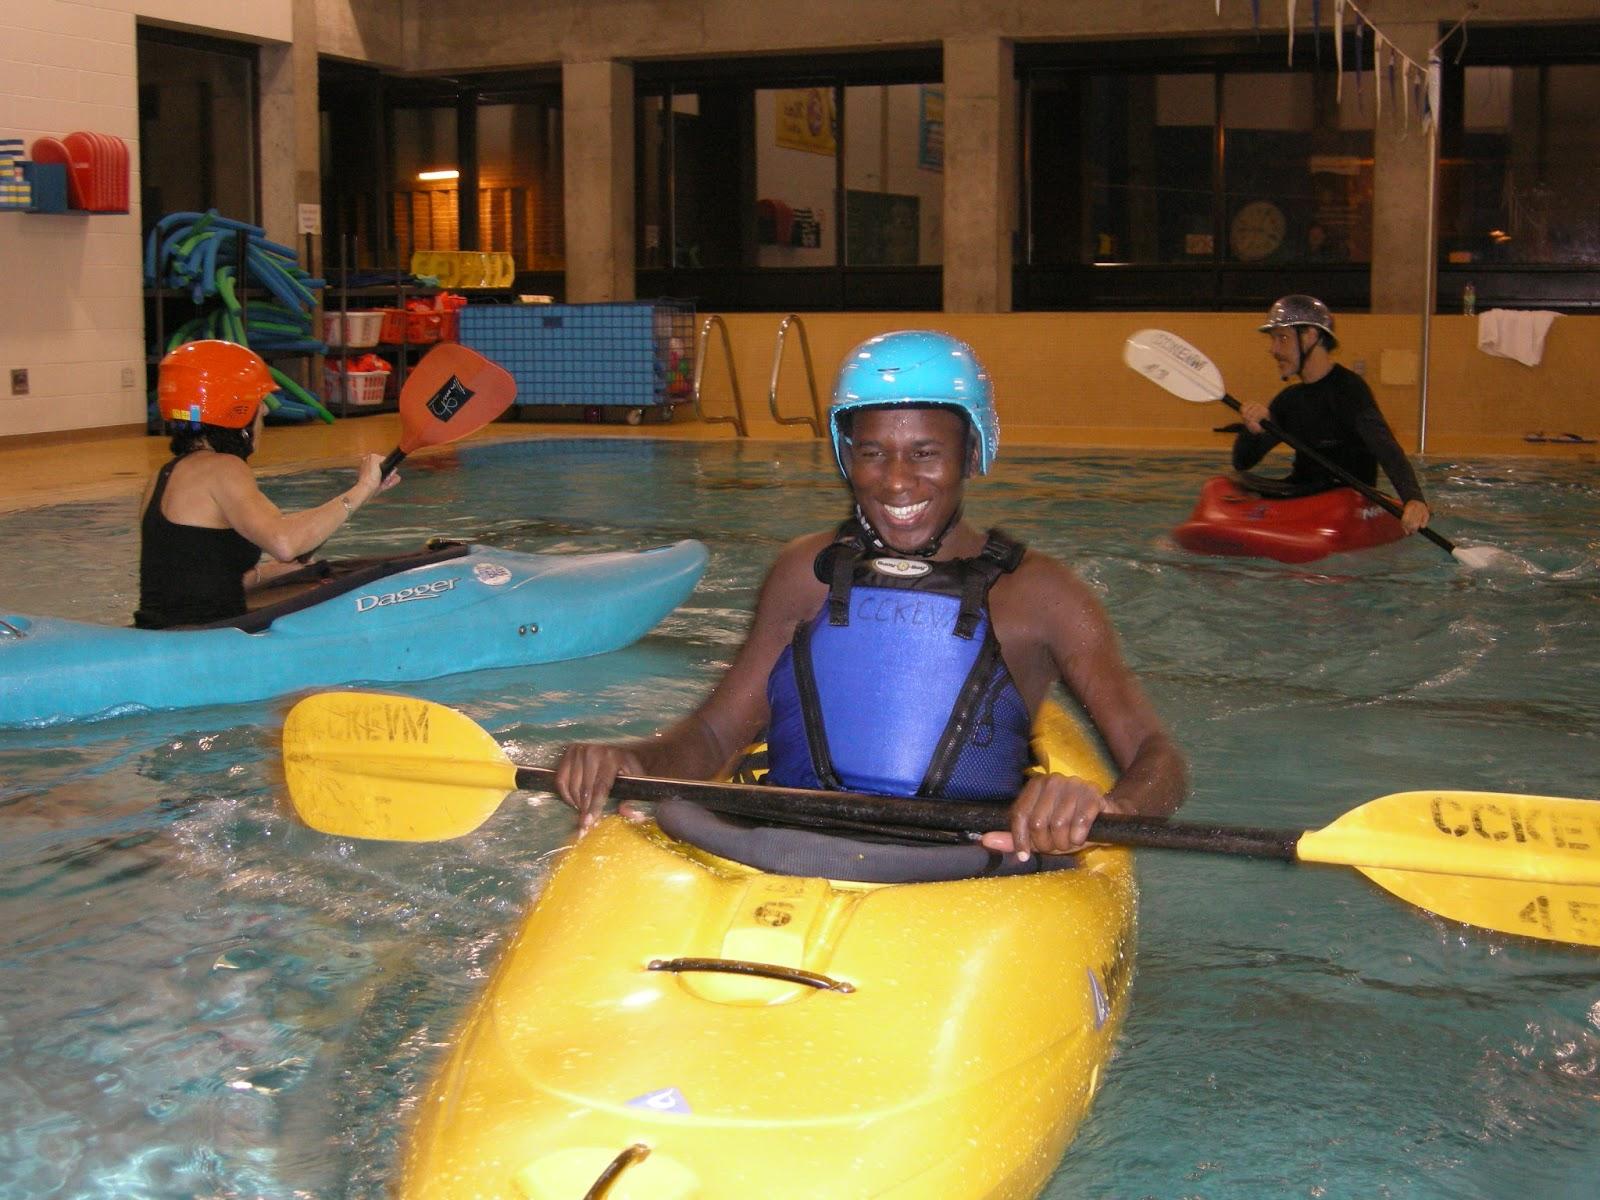 Plein air interculturel Kayak en piscine 9 novembre Kayaking pool session November 9th